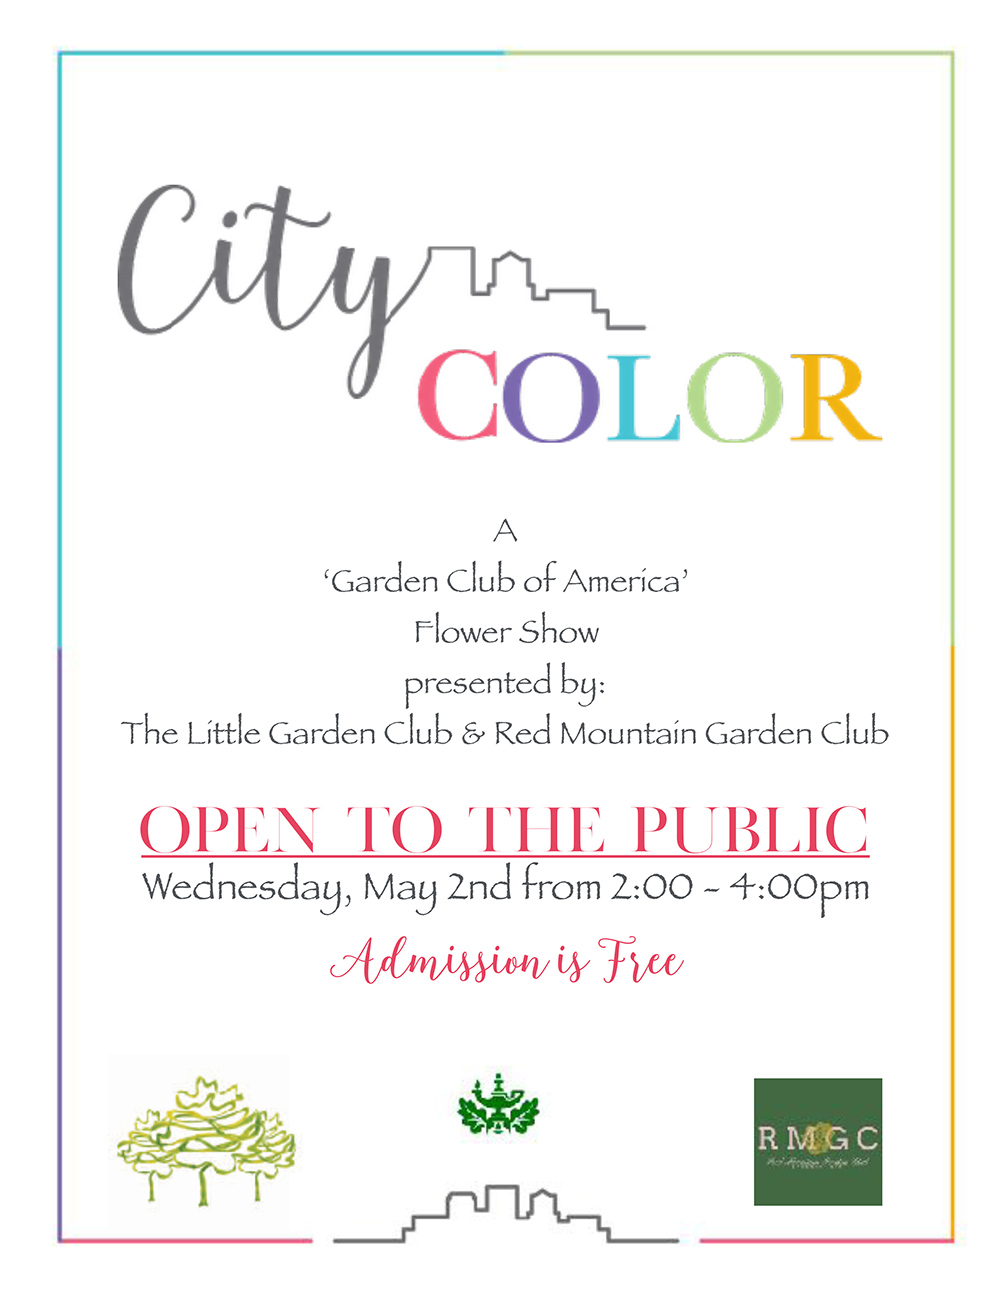 City Color Flower Show 2018 - open to the public